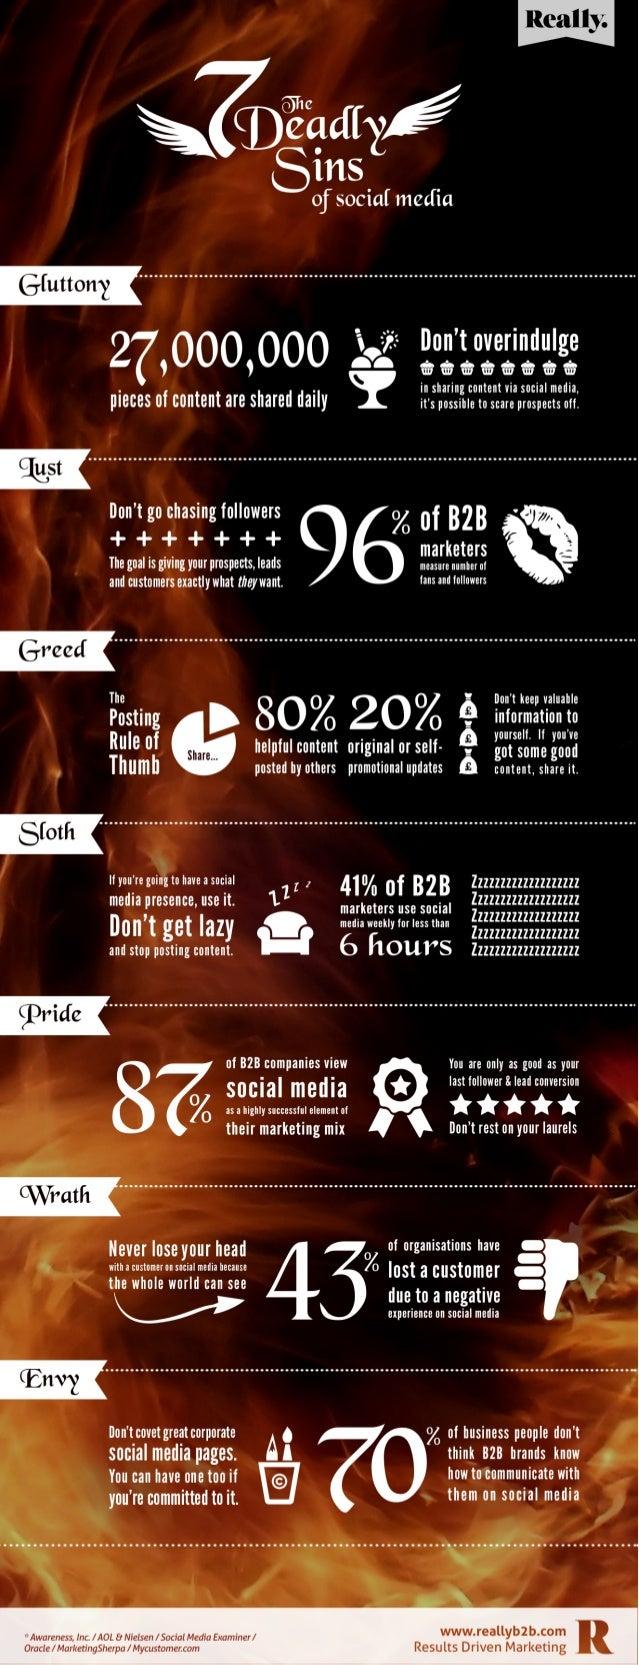 The Seven Deadly Sins of Social Media